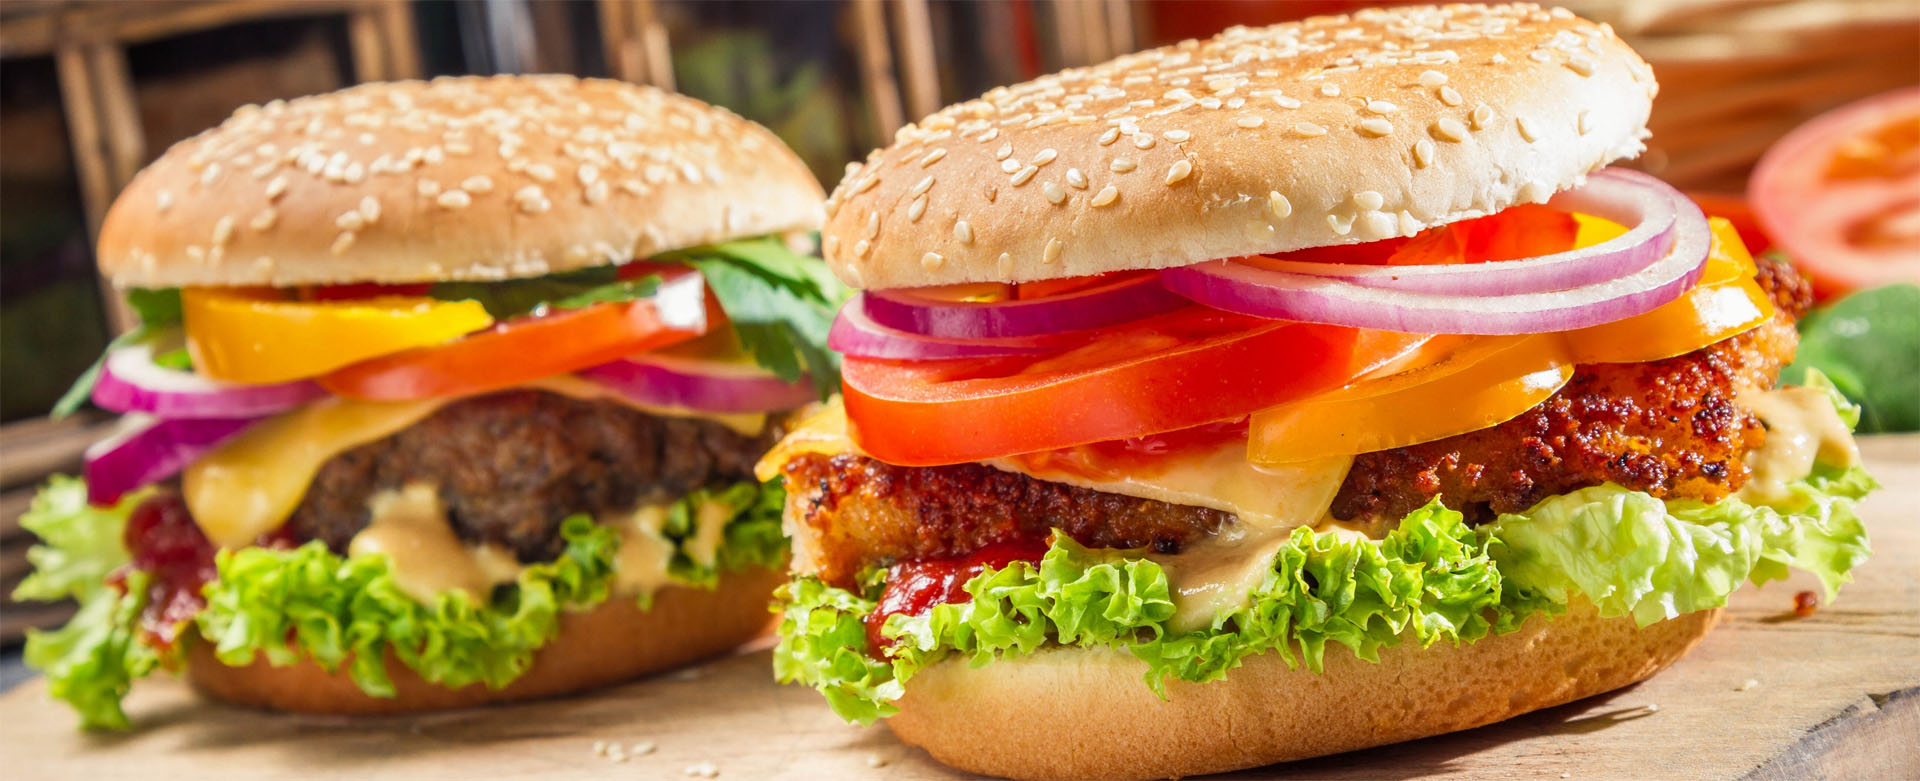 biohamburger.jpg